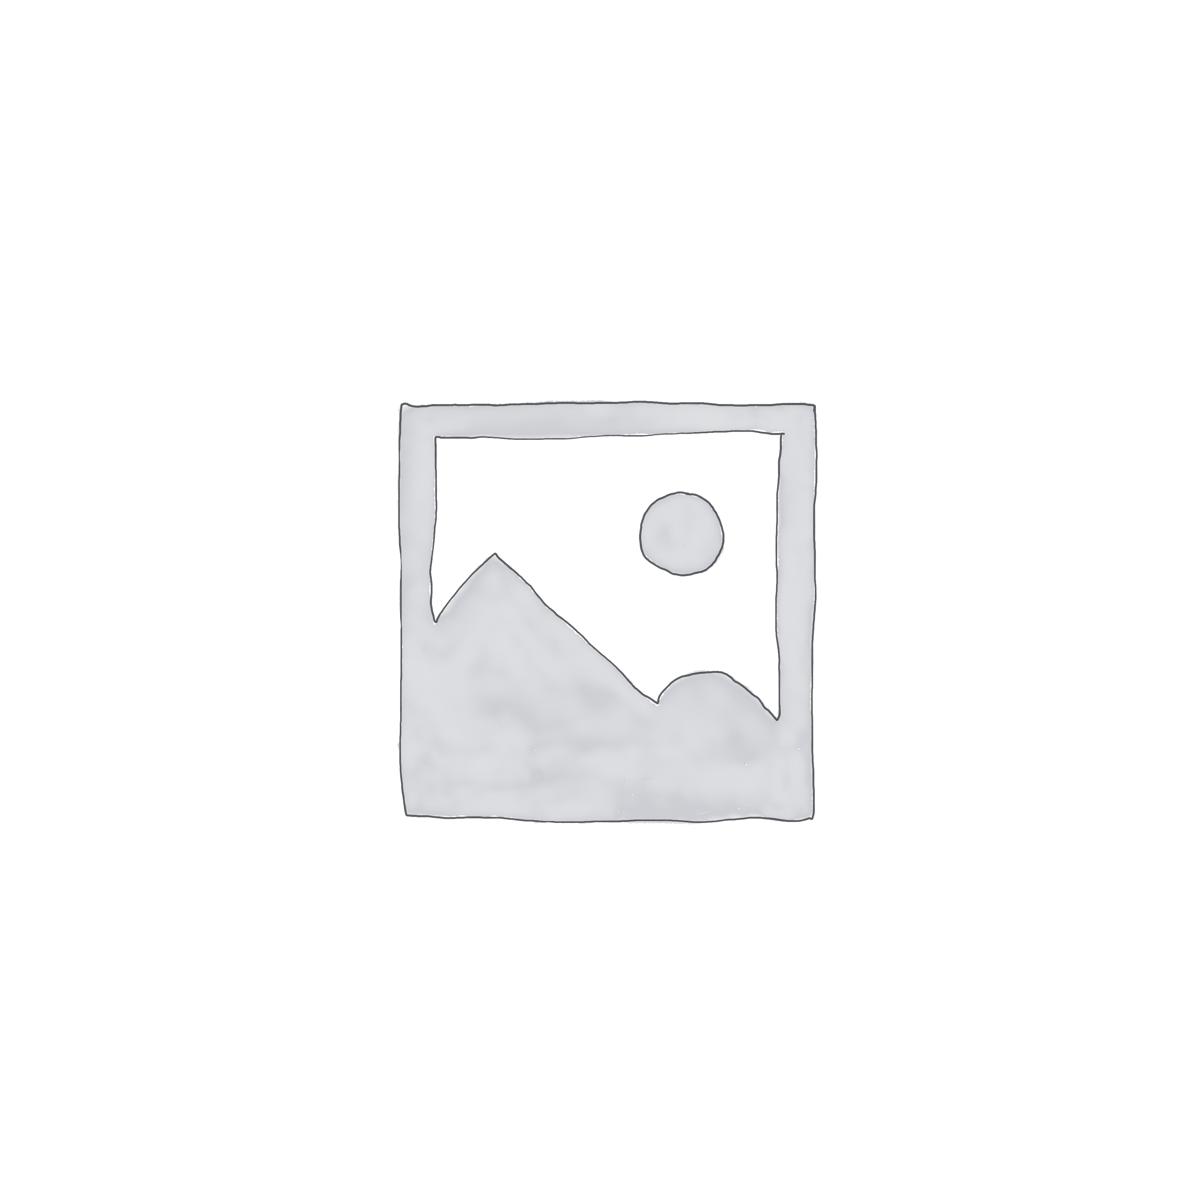 Pflanzkasten Kiefer/Weide, mit Folie 80 x 40 x 40